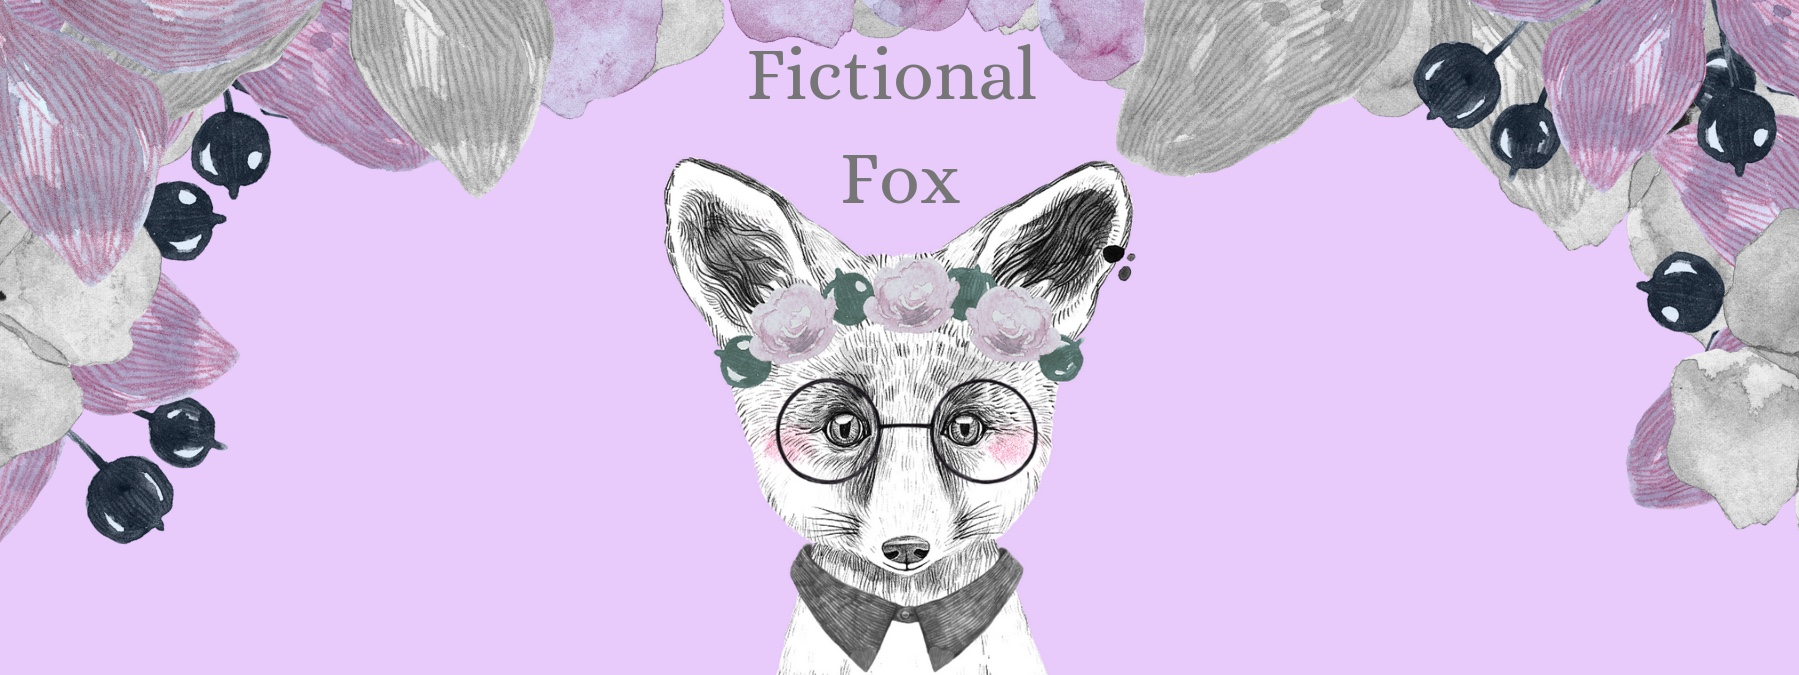 Fictional Fox